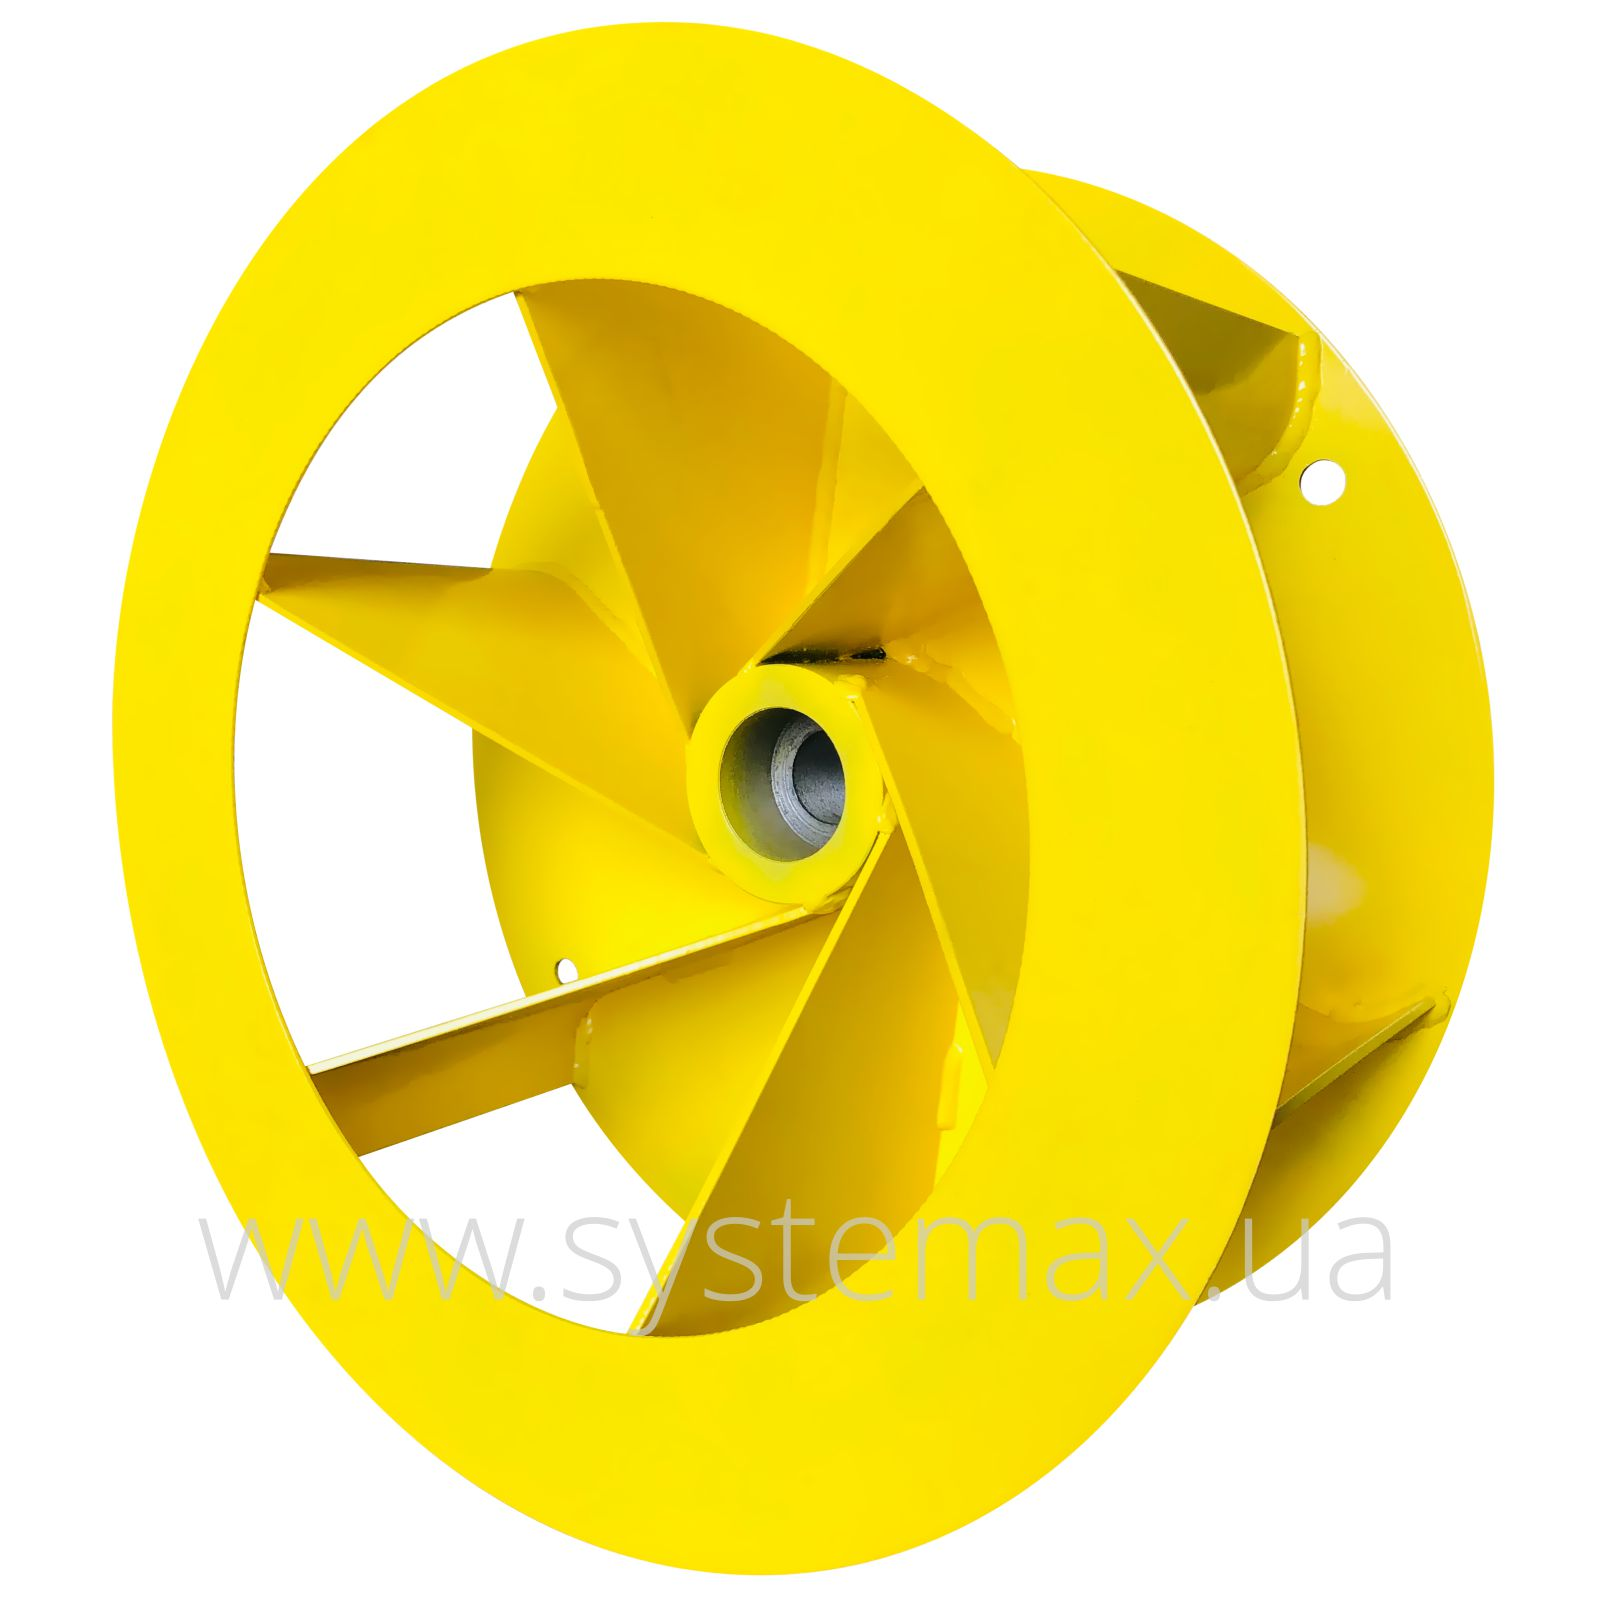 Фото робочого колеса пилового вентилятора ВЦП 6-46-2,5